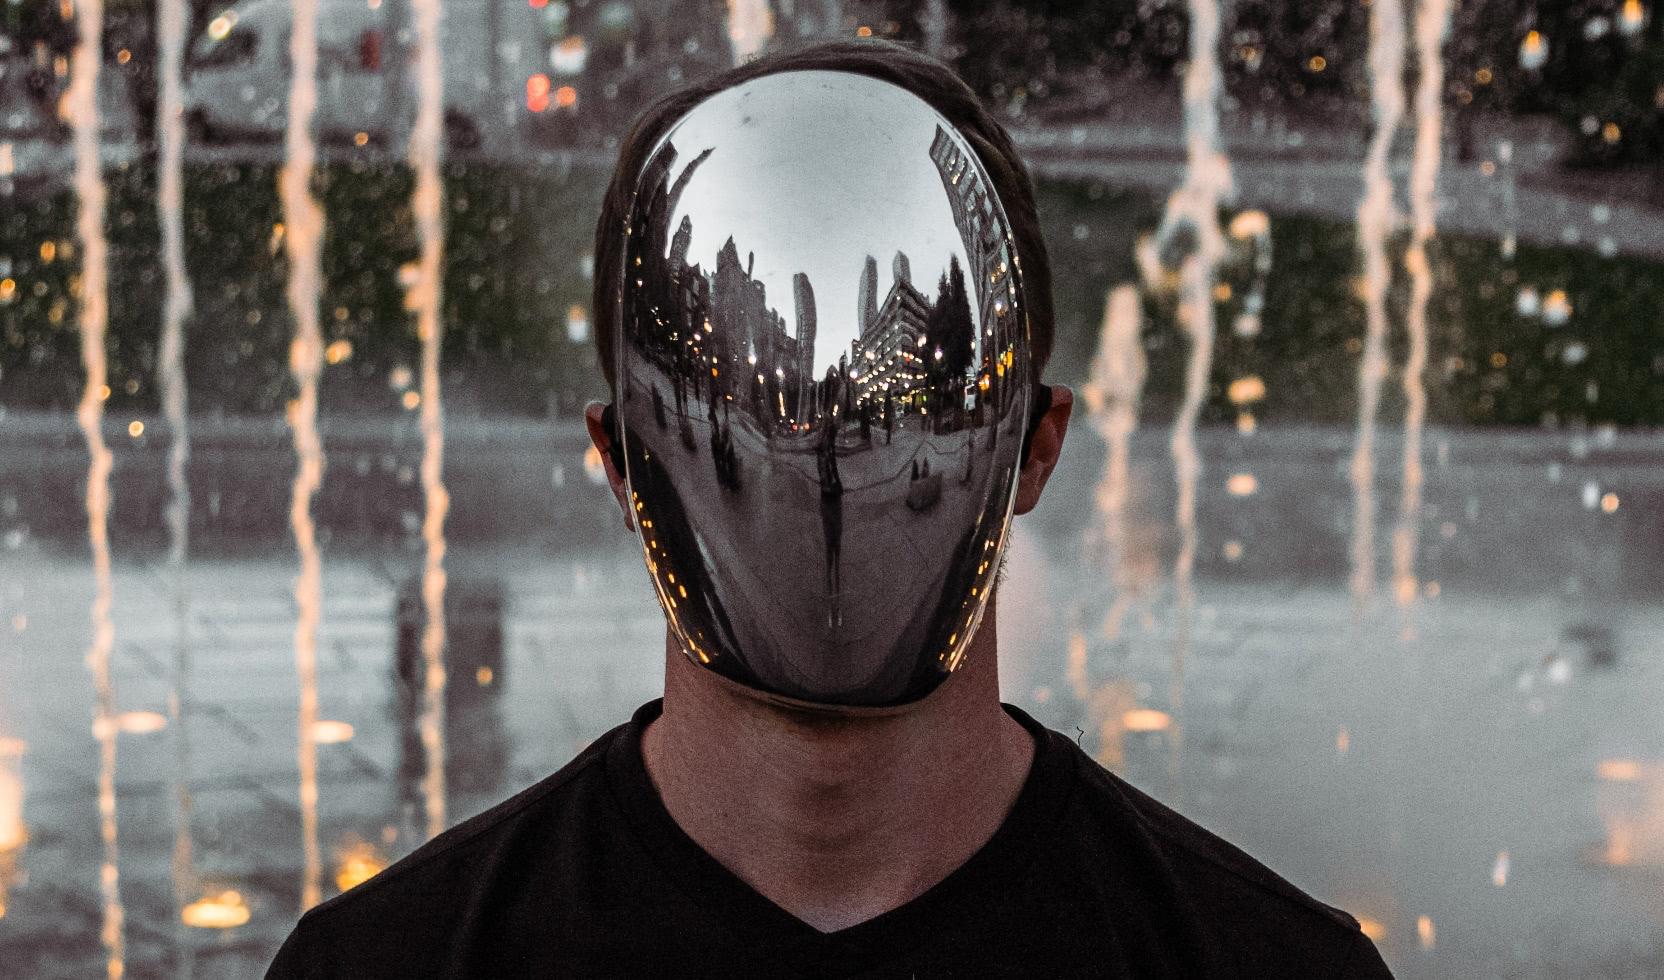 Reflective chrome face mask.